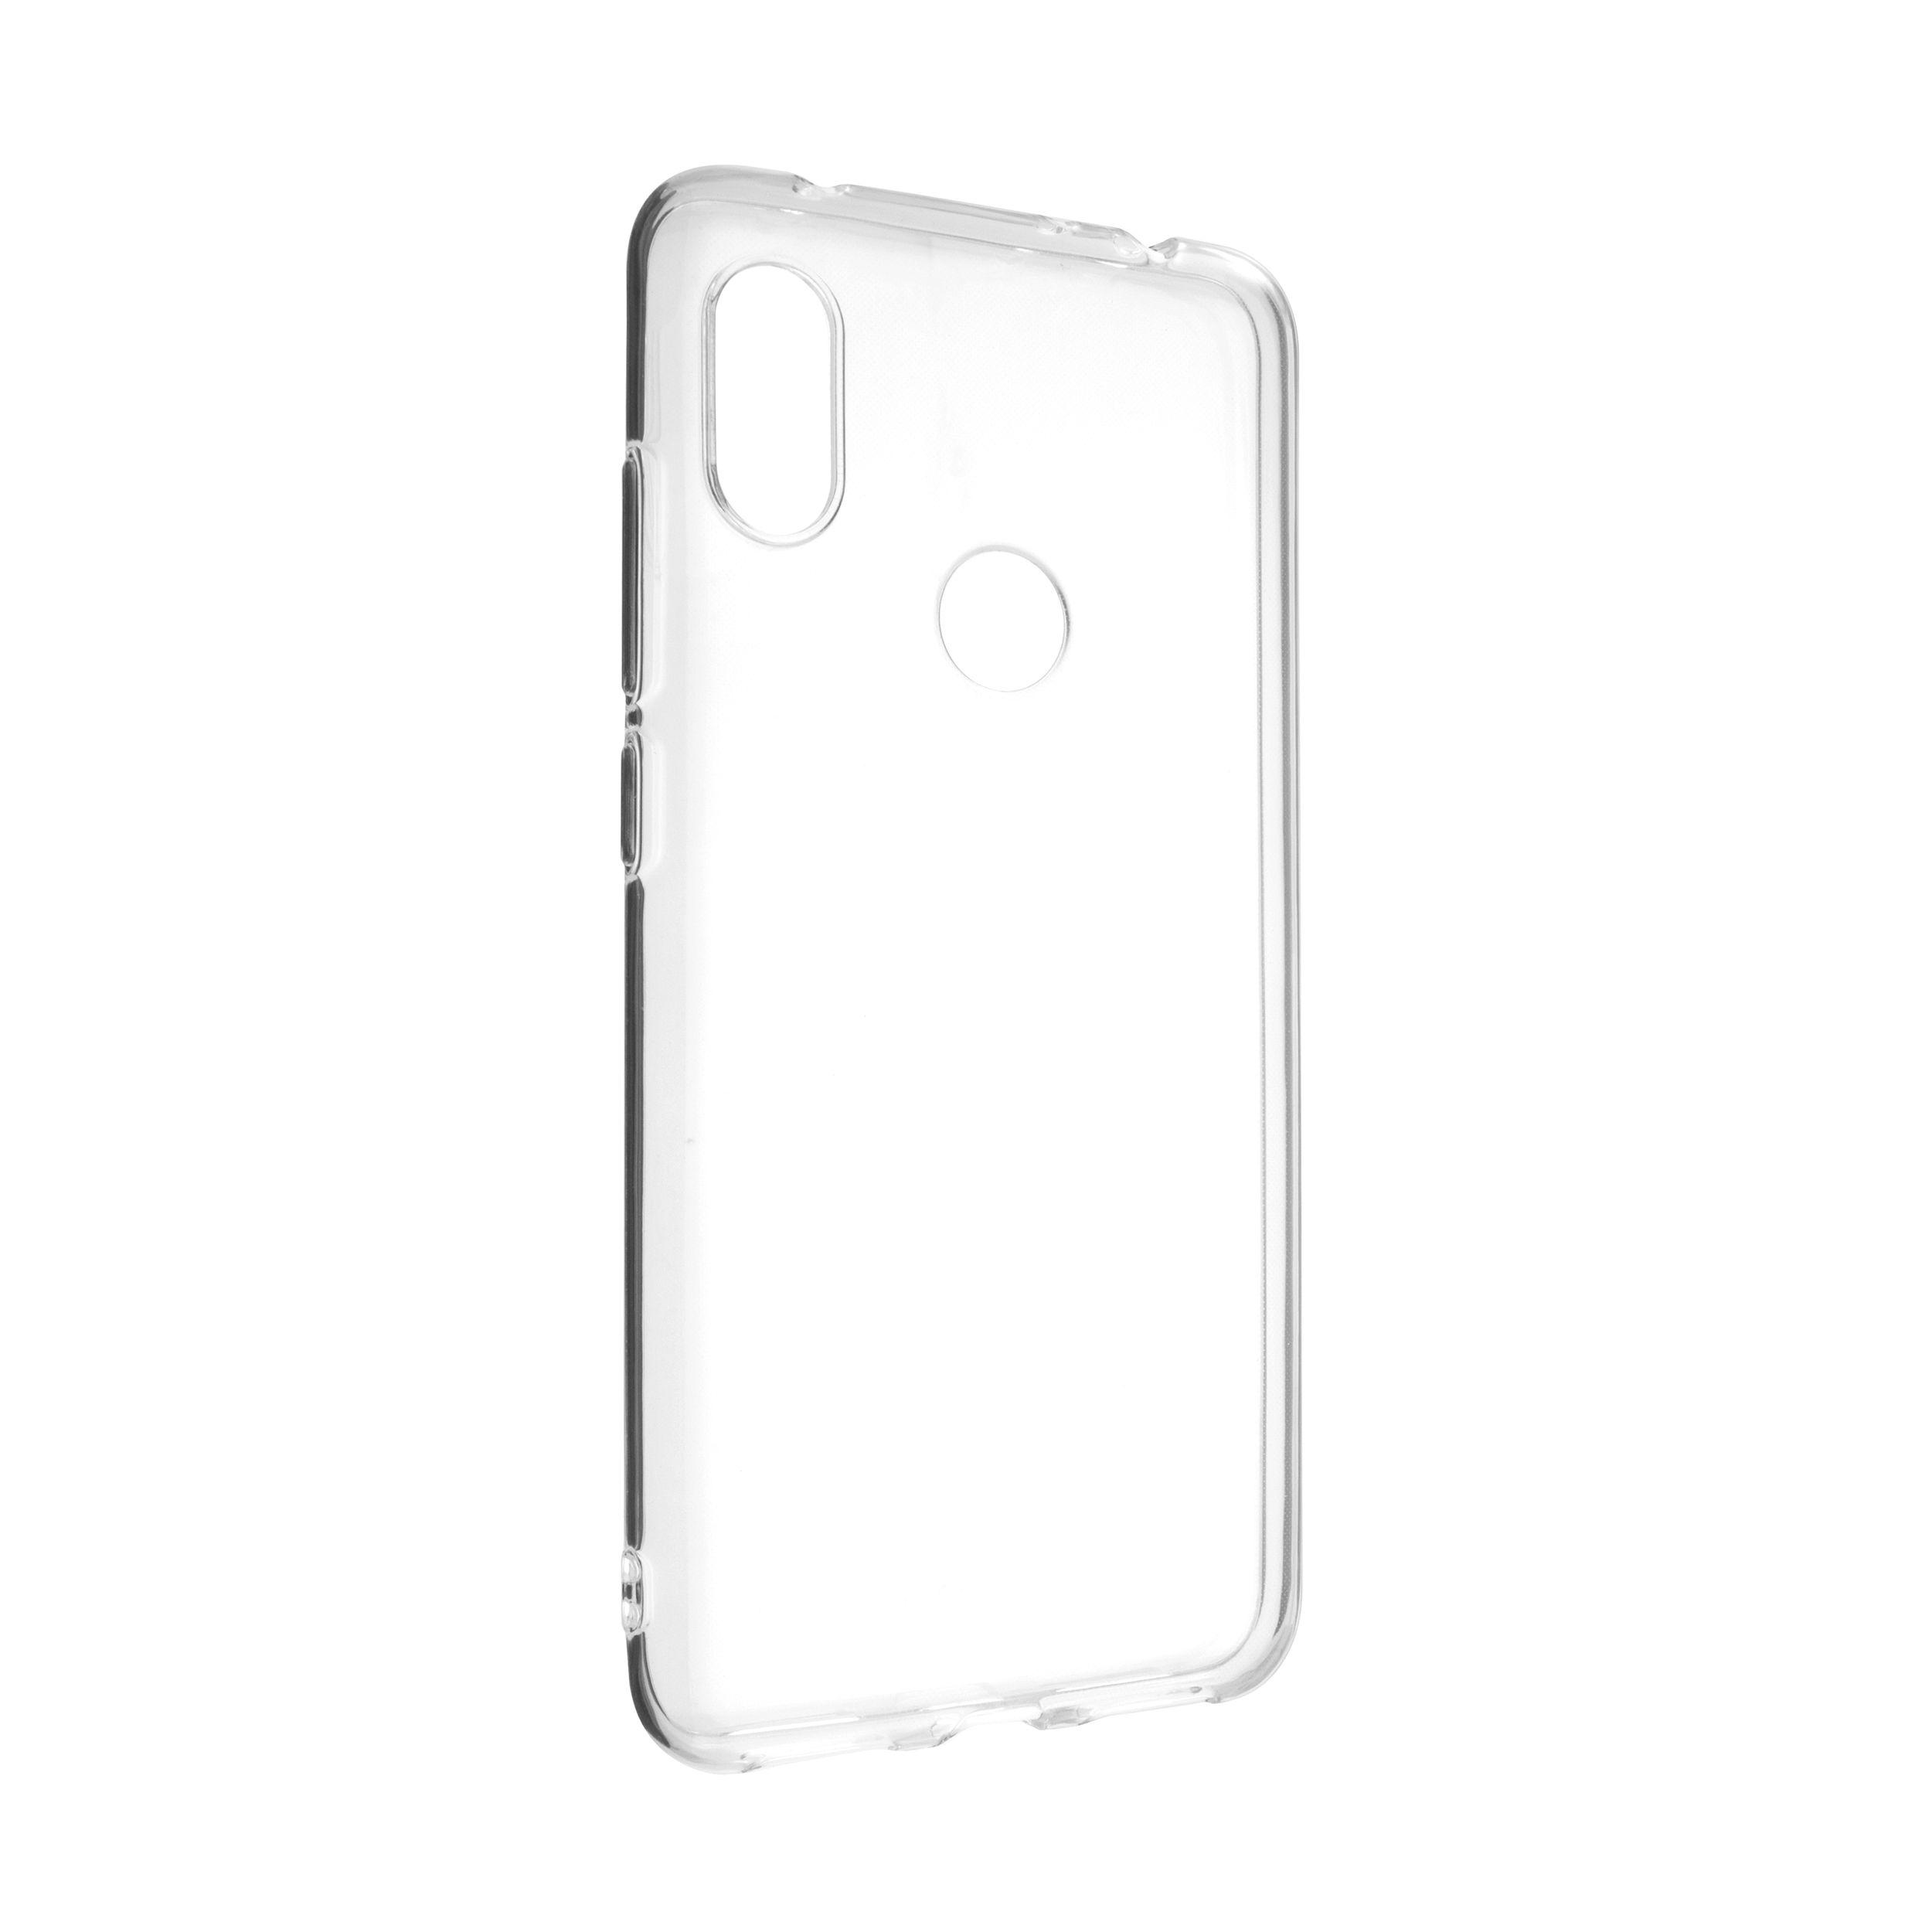 TPU gelové pouzdro FIXED pro Xiaomi Redmi Note 6, čiré